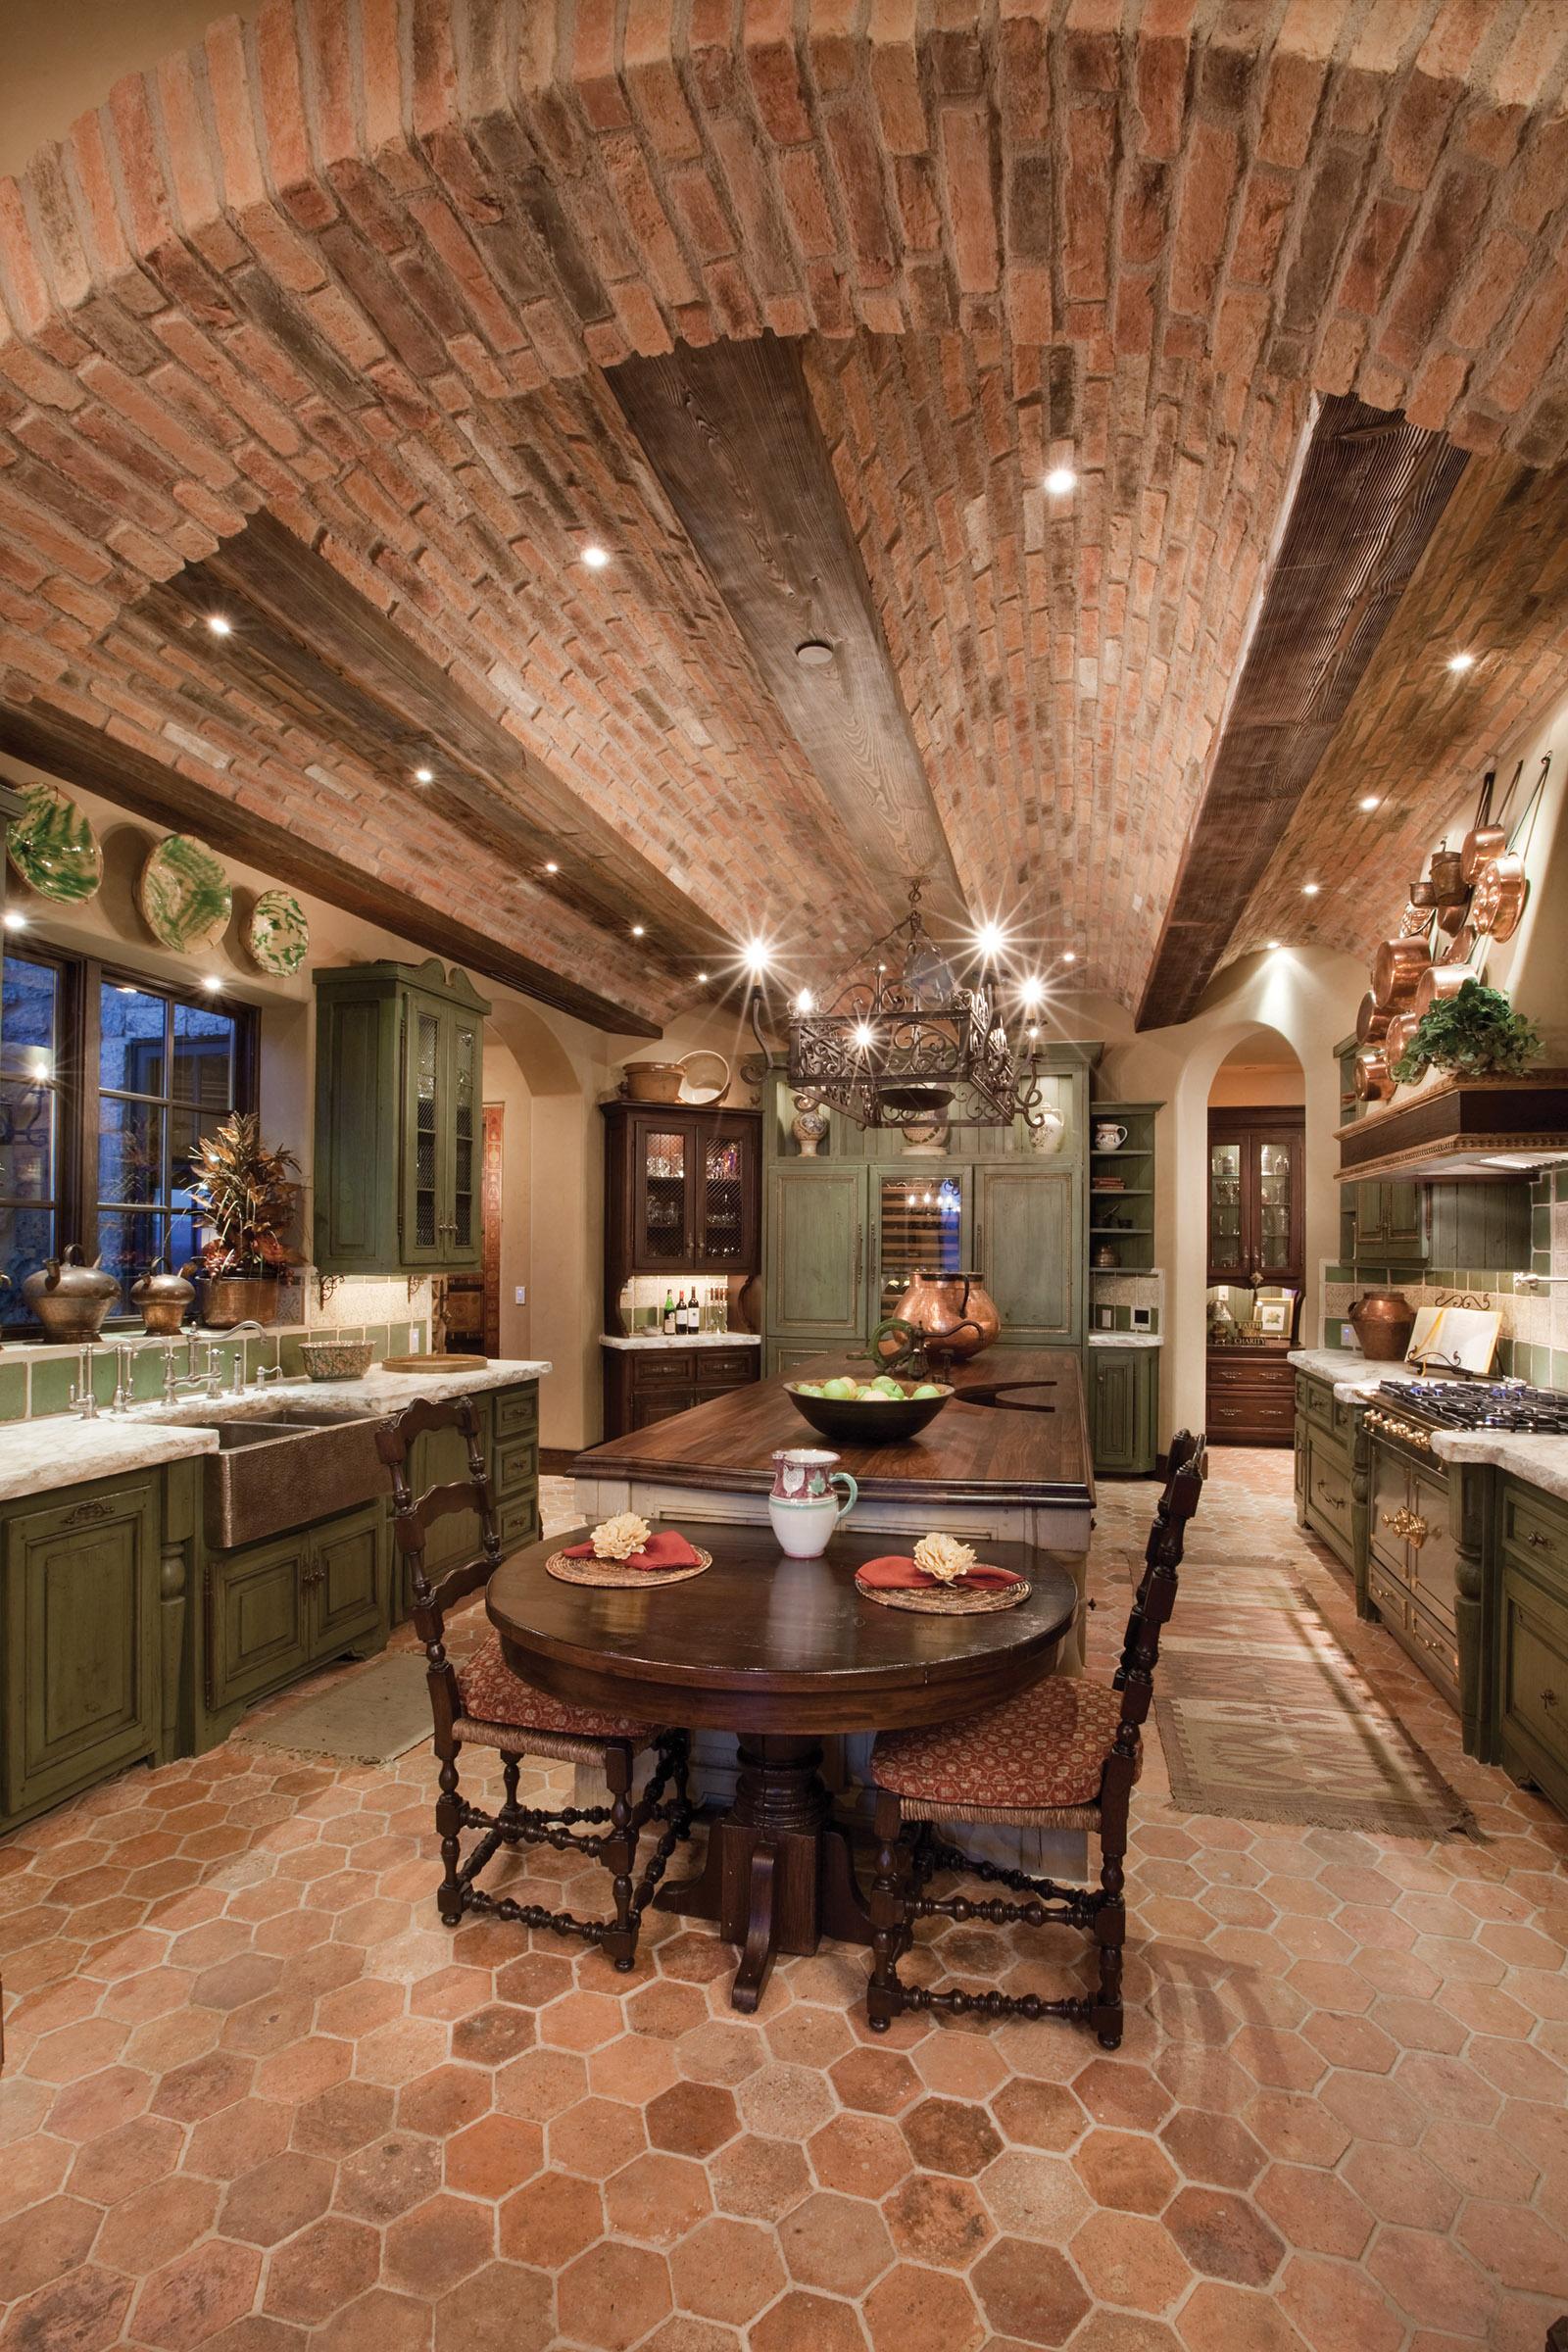 Vegas Old World Kitchen.jpg